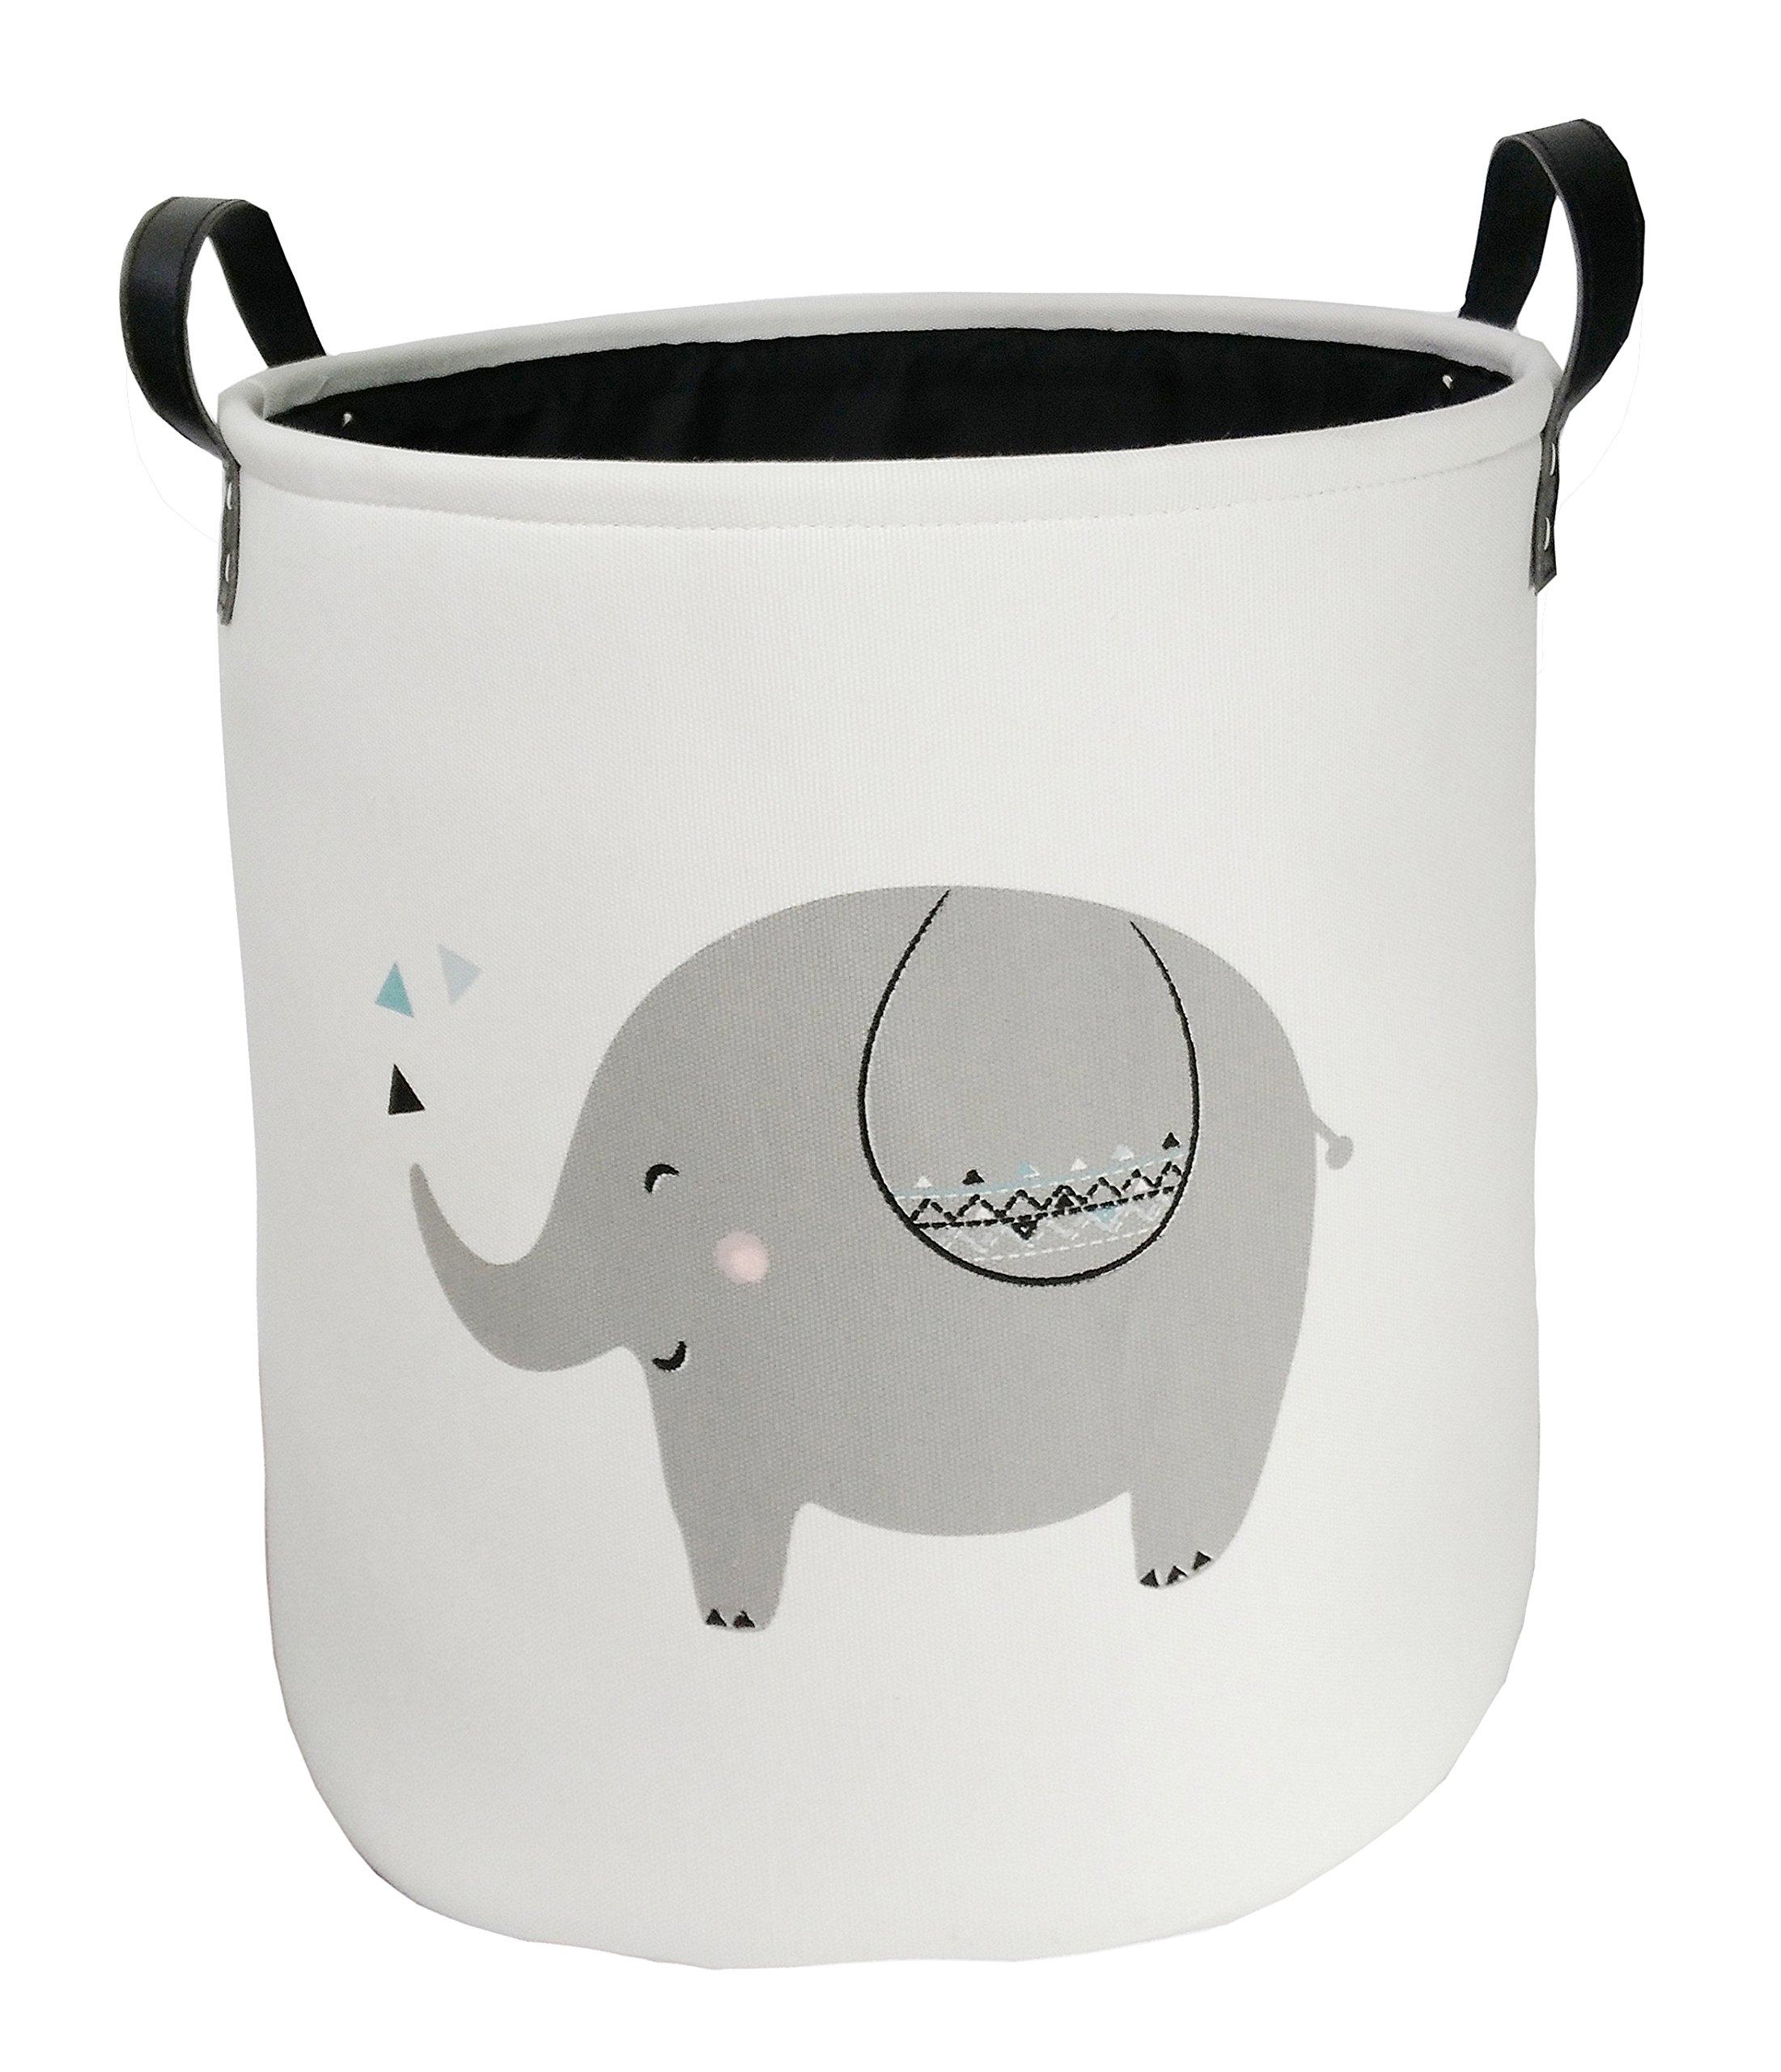 Storage Bins Toy Box Collapsible Nursery Hamper for Laundry,Toy Organizer, Kids Hamper,Baby Room Decor(Elephant)